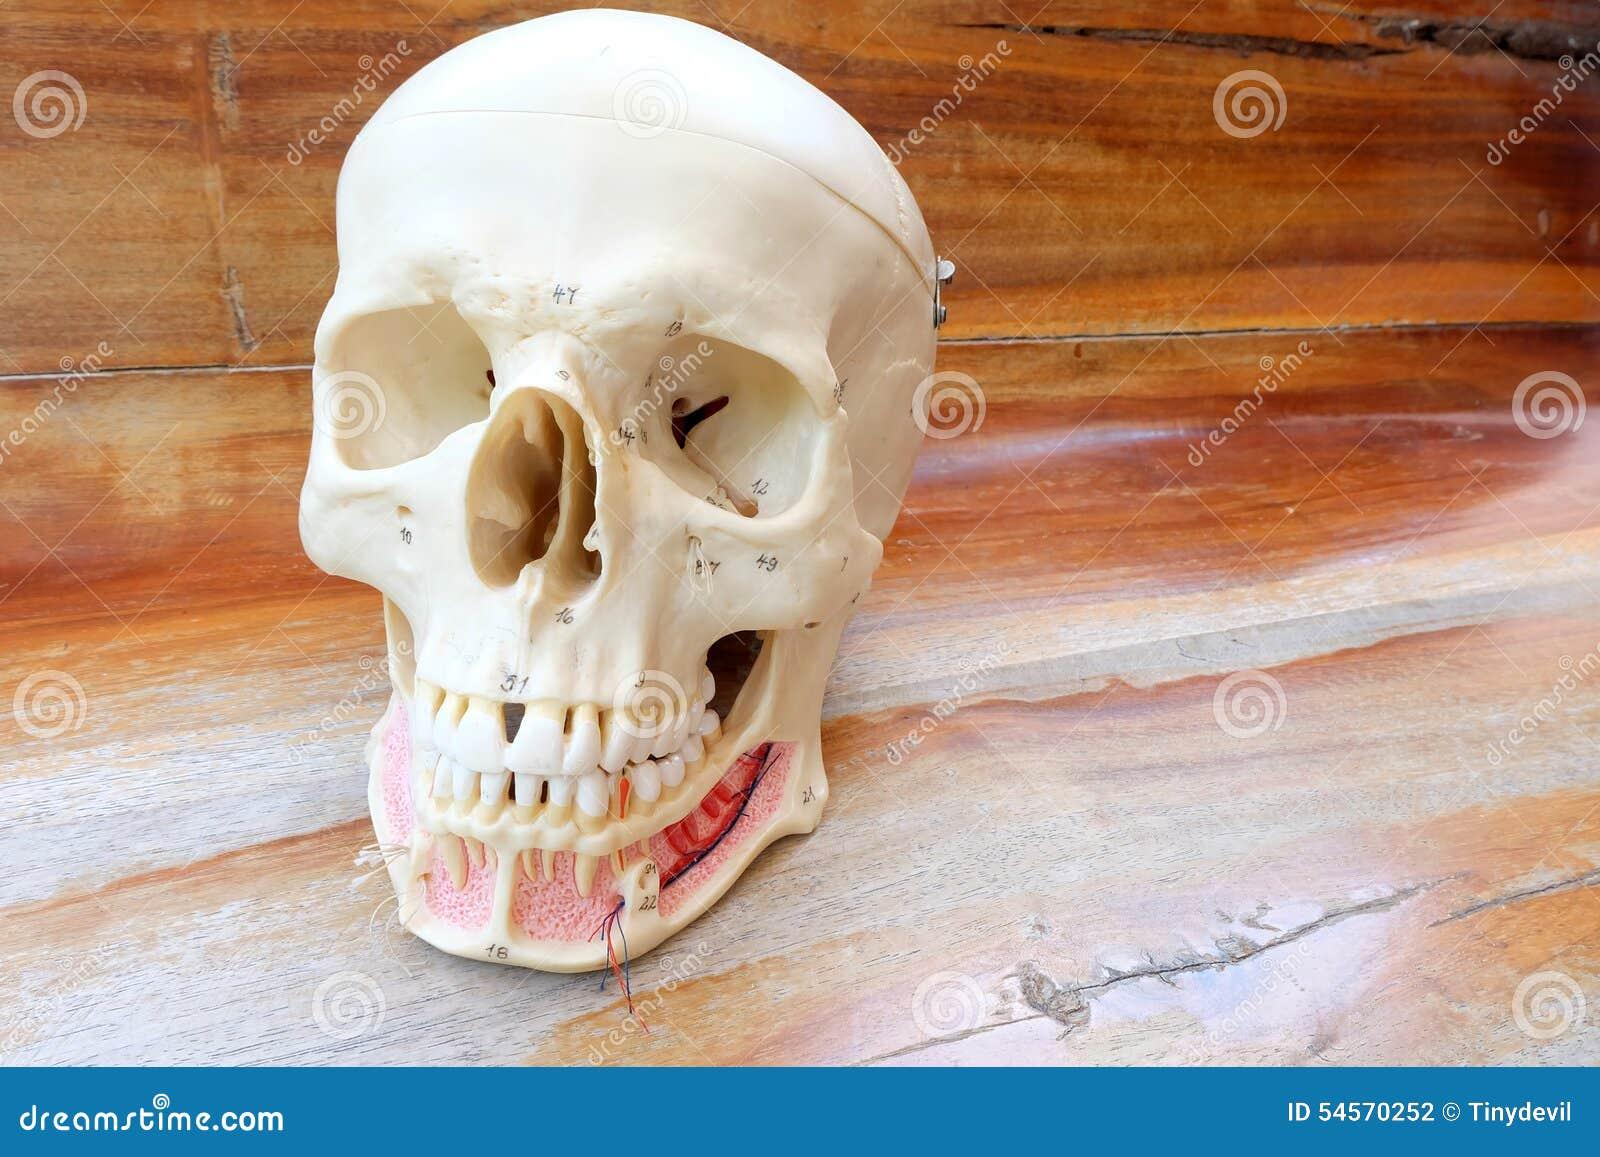 Human skull anatomy model stock photo. Image of anatomy - 54570252